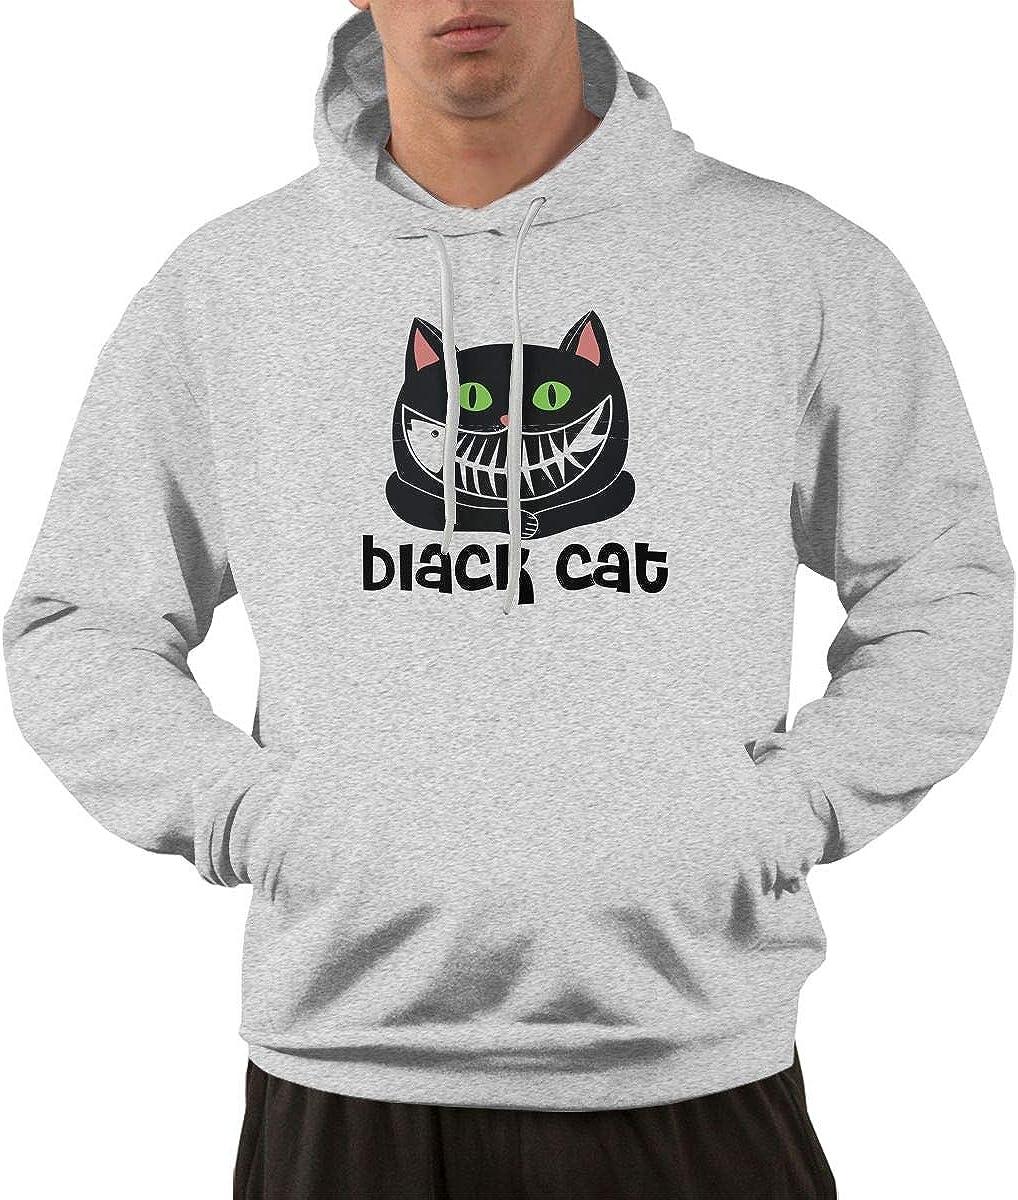 Black Cat Men Printed Pullover Long Sleeve Hooded Black Sweatshirts with Pockets